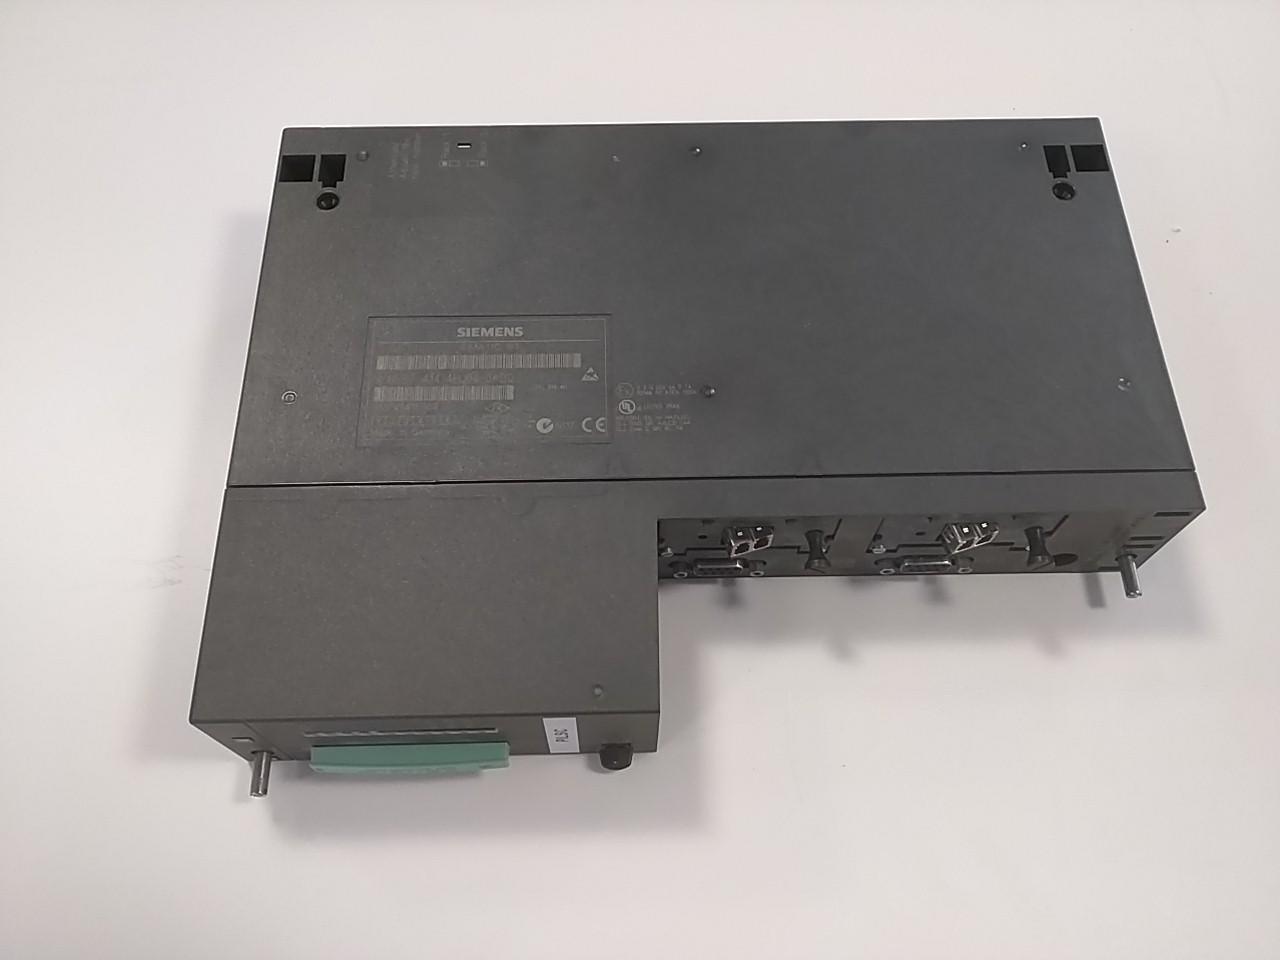 Siemens 6 gk7443 ethernet communication module 2